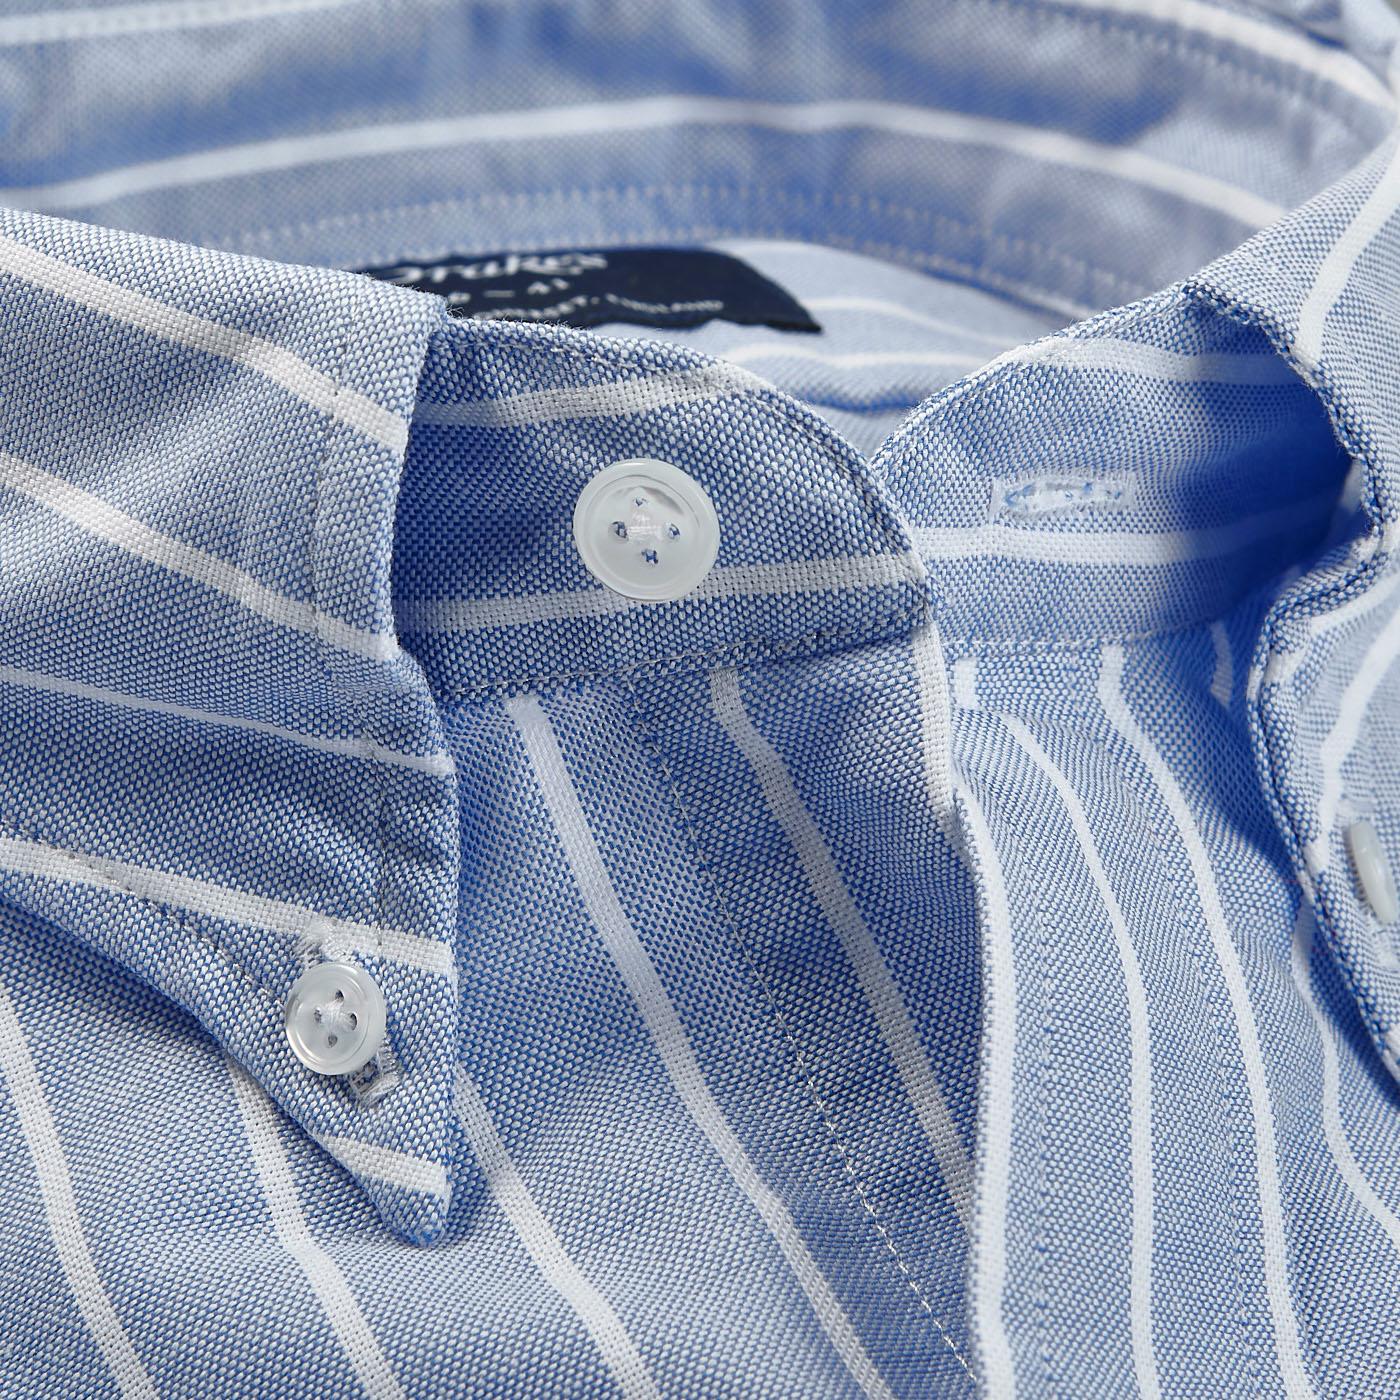 Drake's Blue Wide Striped Cotton Oxford BD Shirt Collar Open